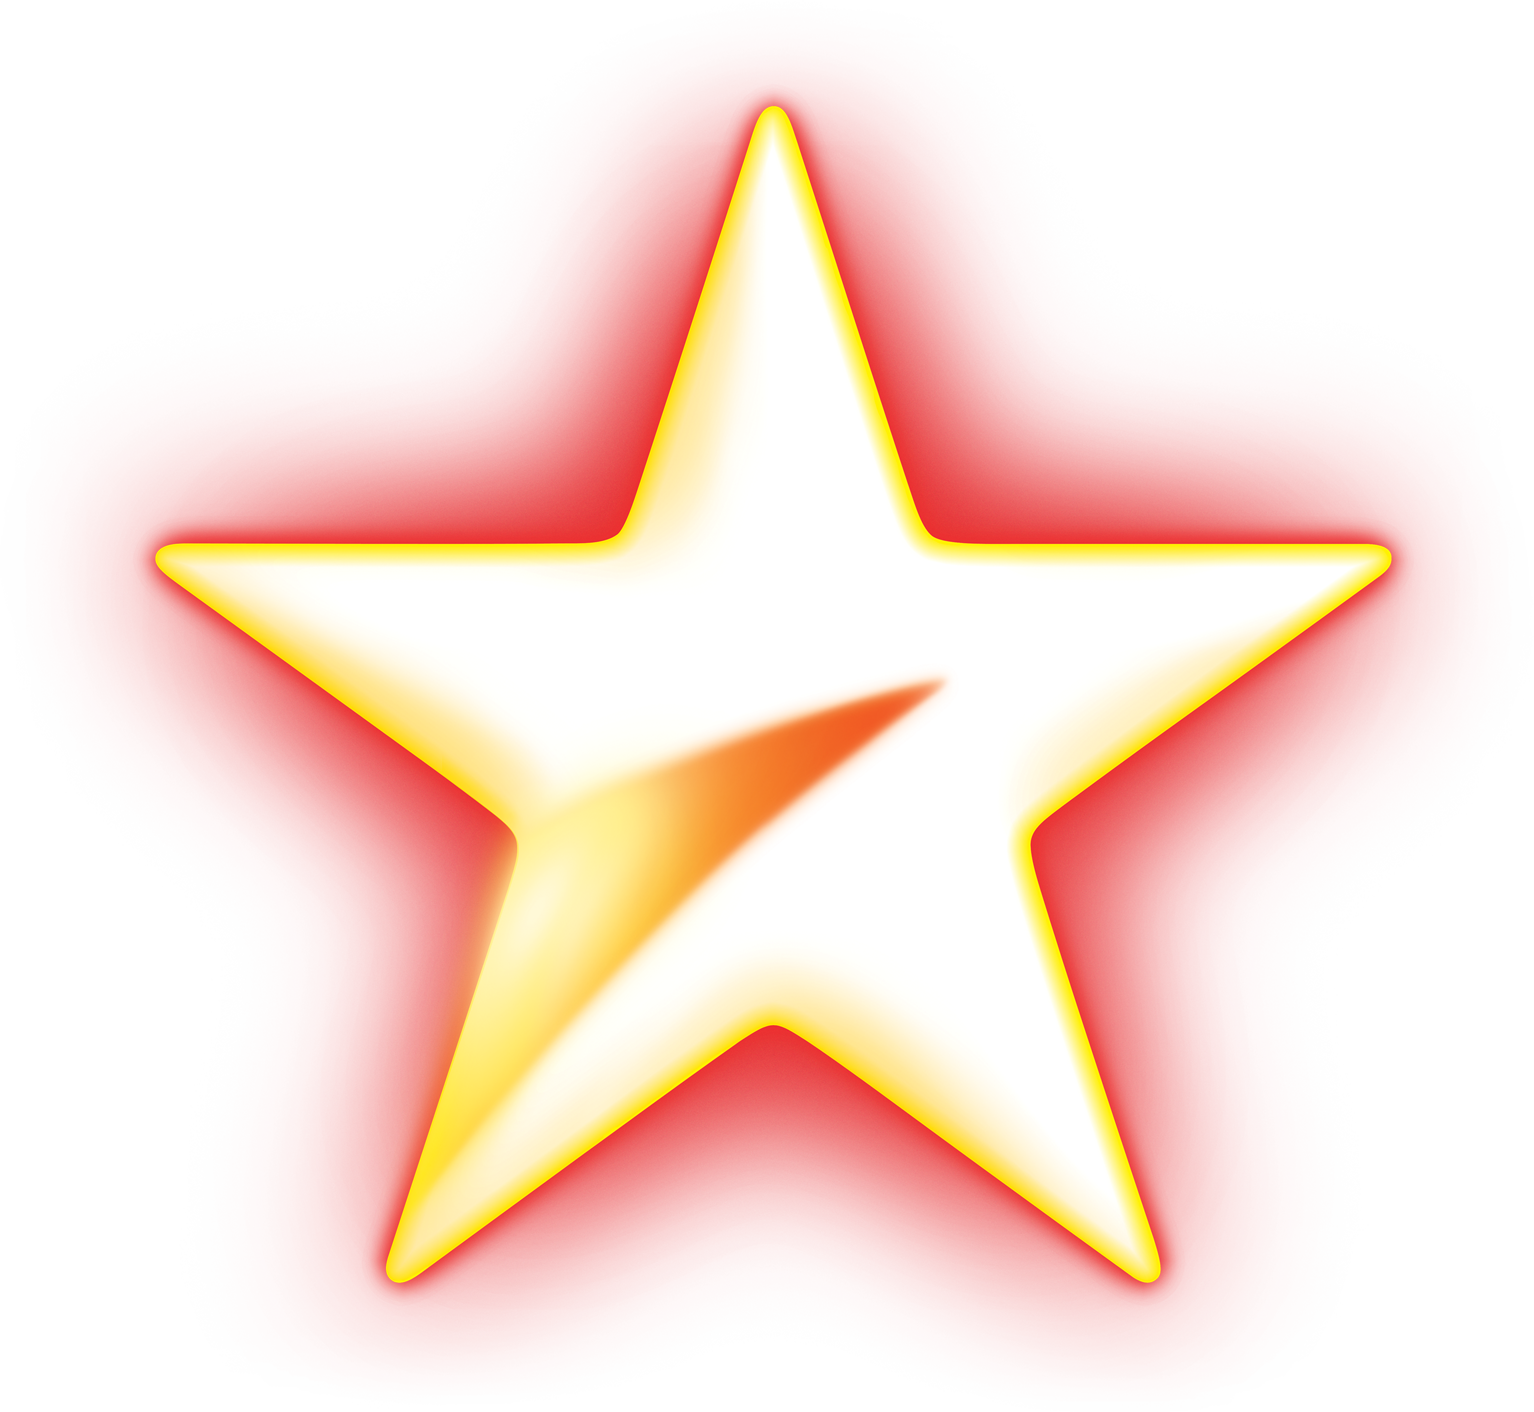 Image - Hot Star Logo.png   Logopedia   FANDOM powered by Wikia